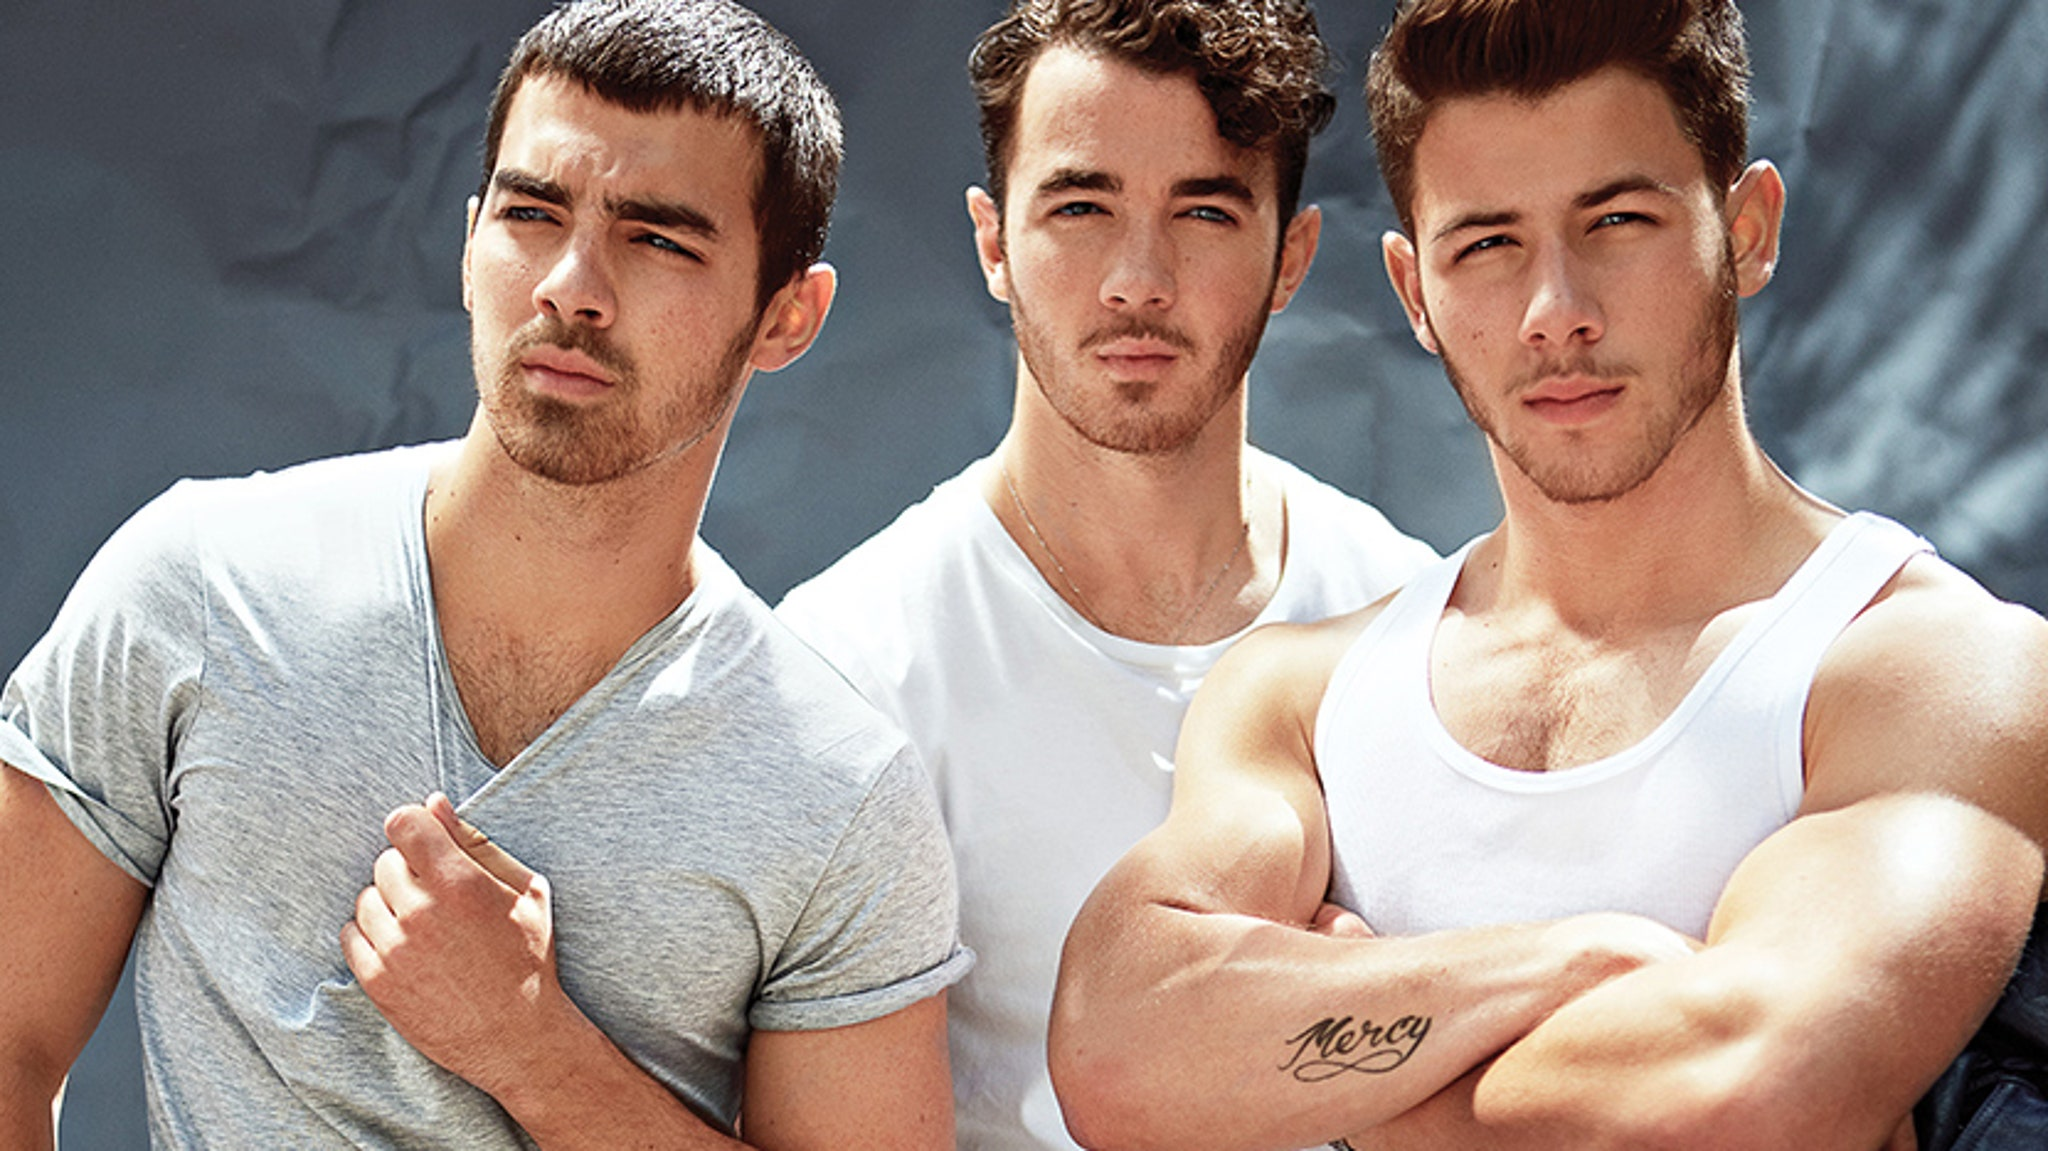 Jonas brothers go for pre